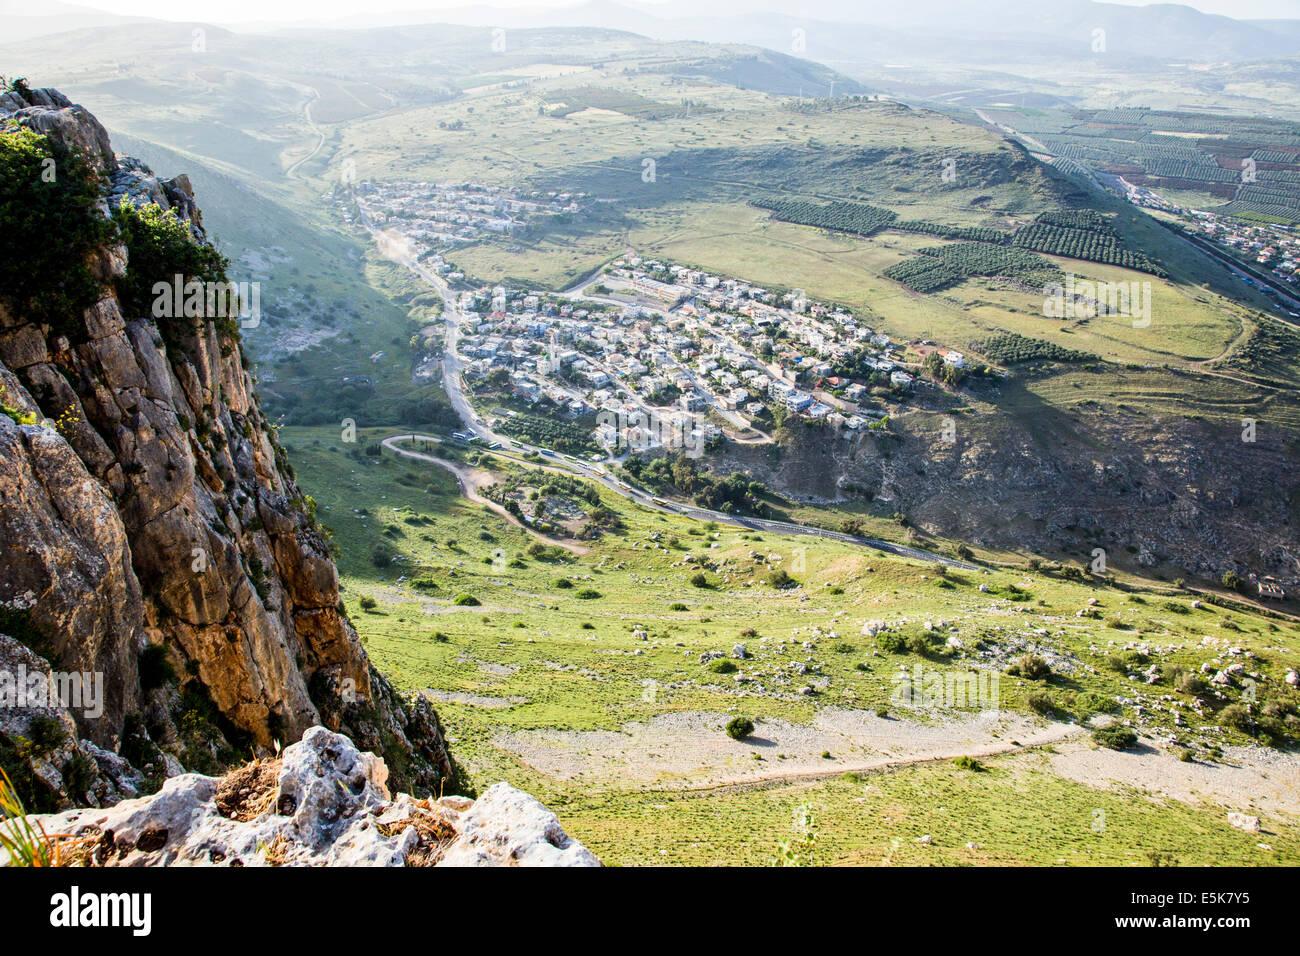 Israel, Lower Galilee, Arbel mountain, Stock Photo